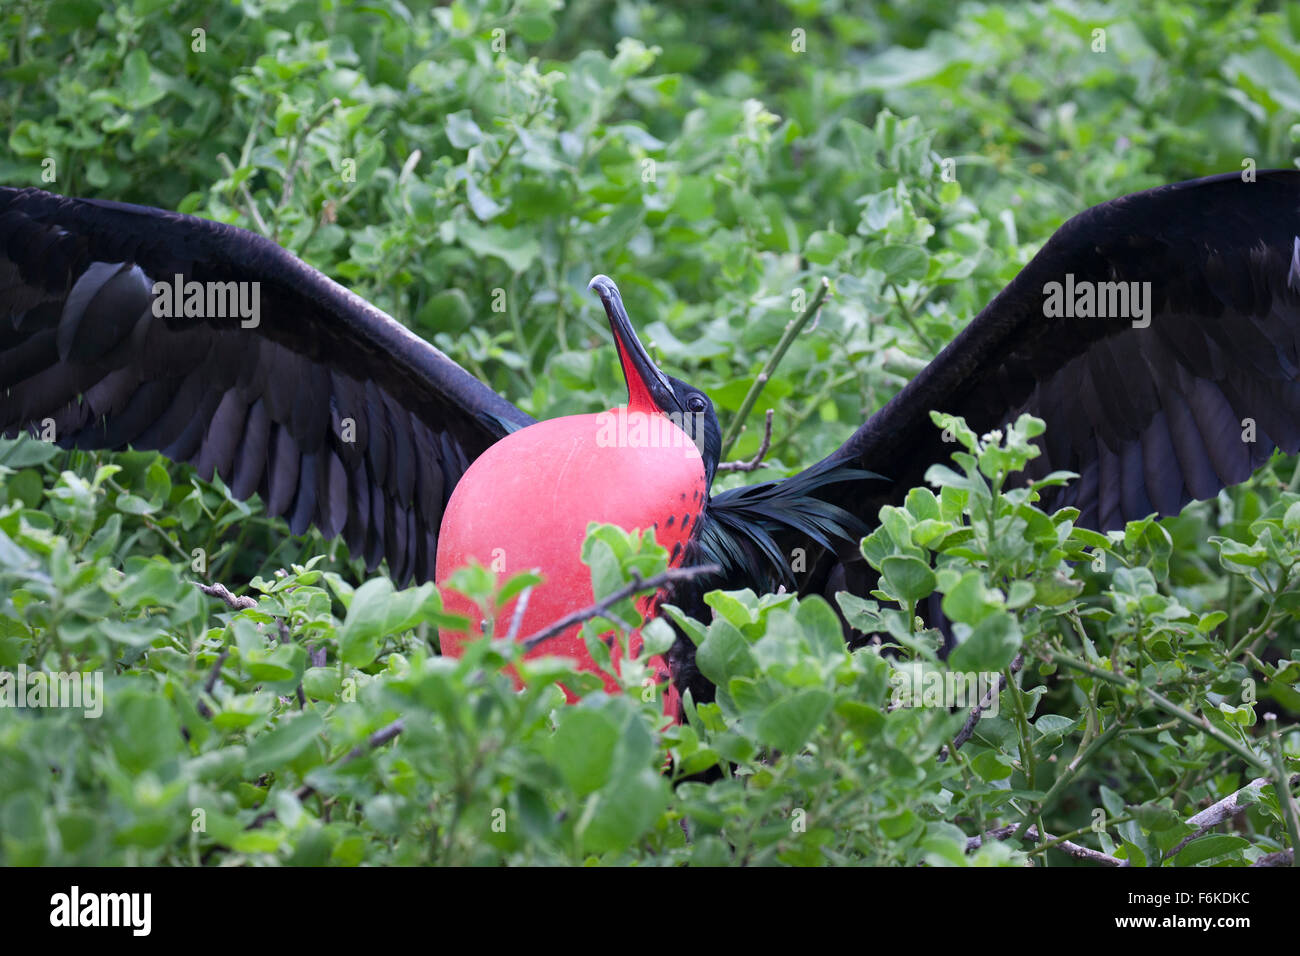 Great frigatebird (Fregata minor) displaying with inflated gular sac (throat pouch). - Stock Image